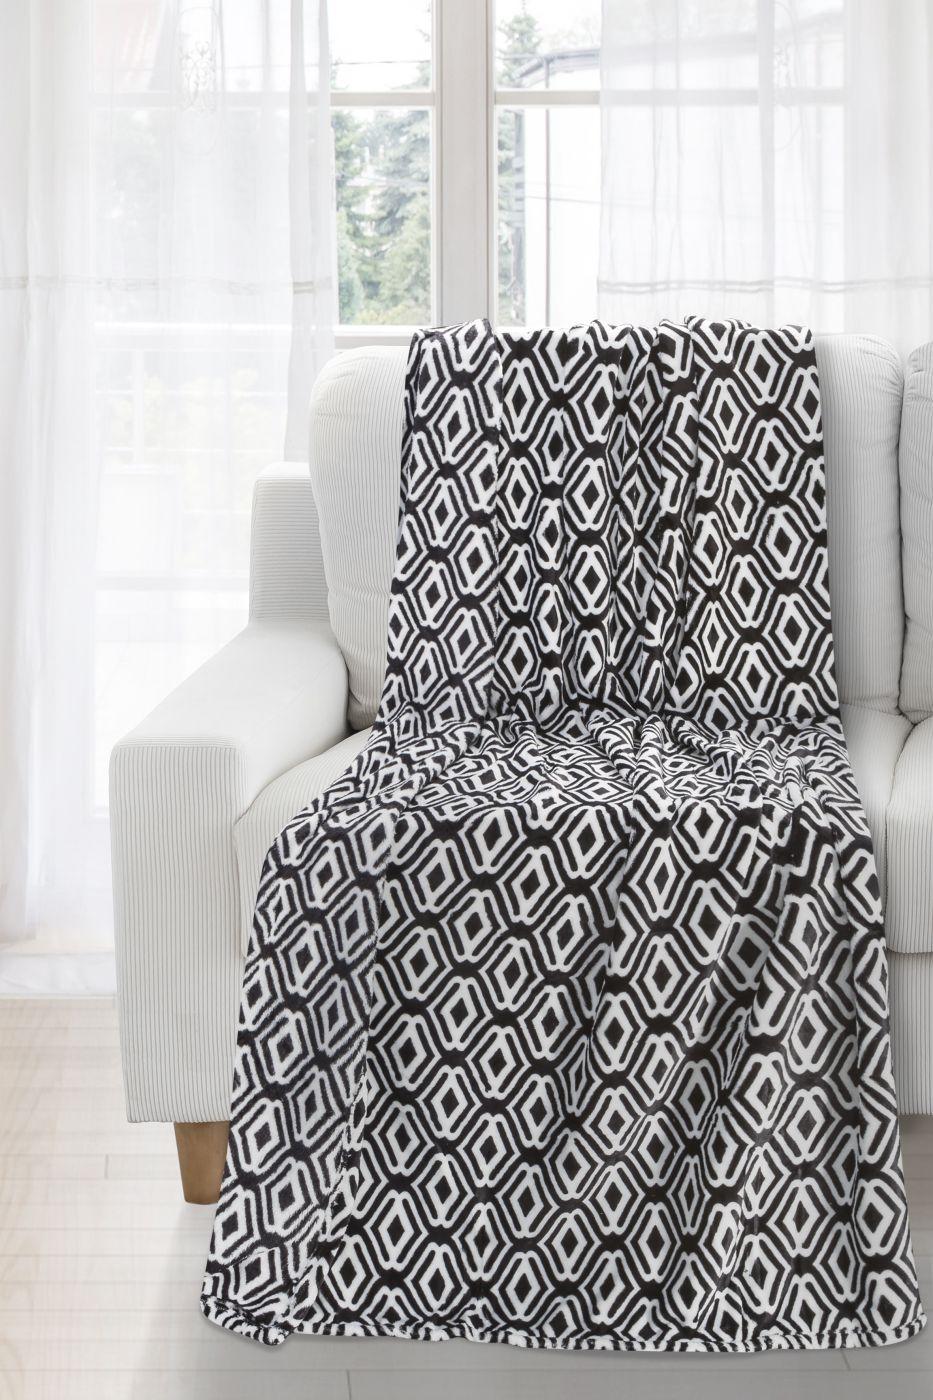 Patura Mary White / Black 150 x 200 cm